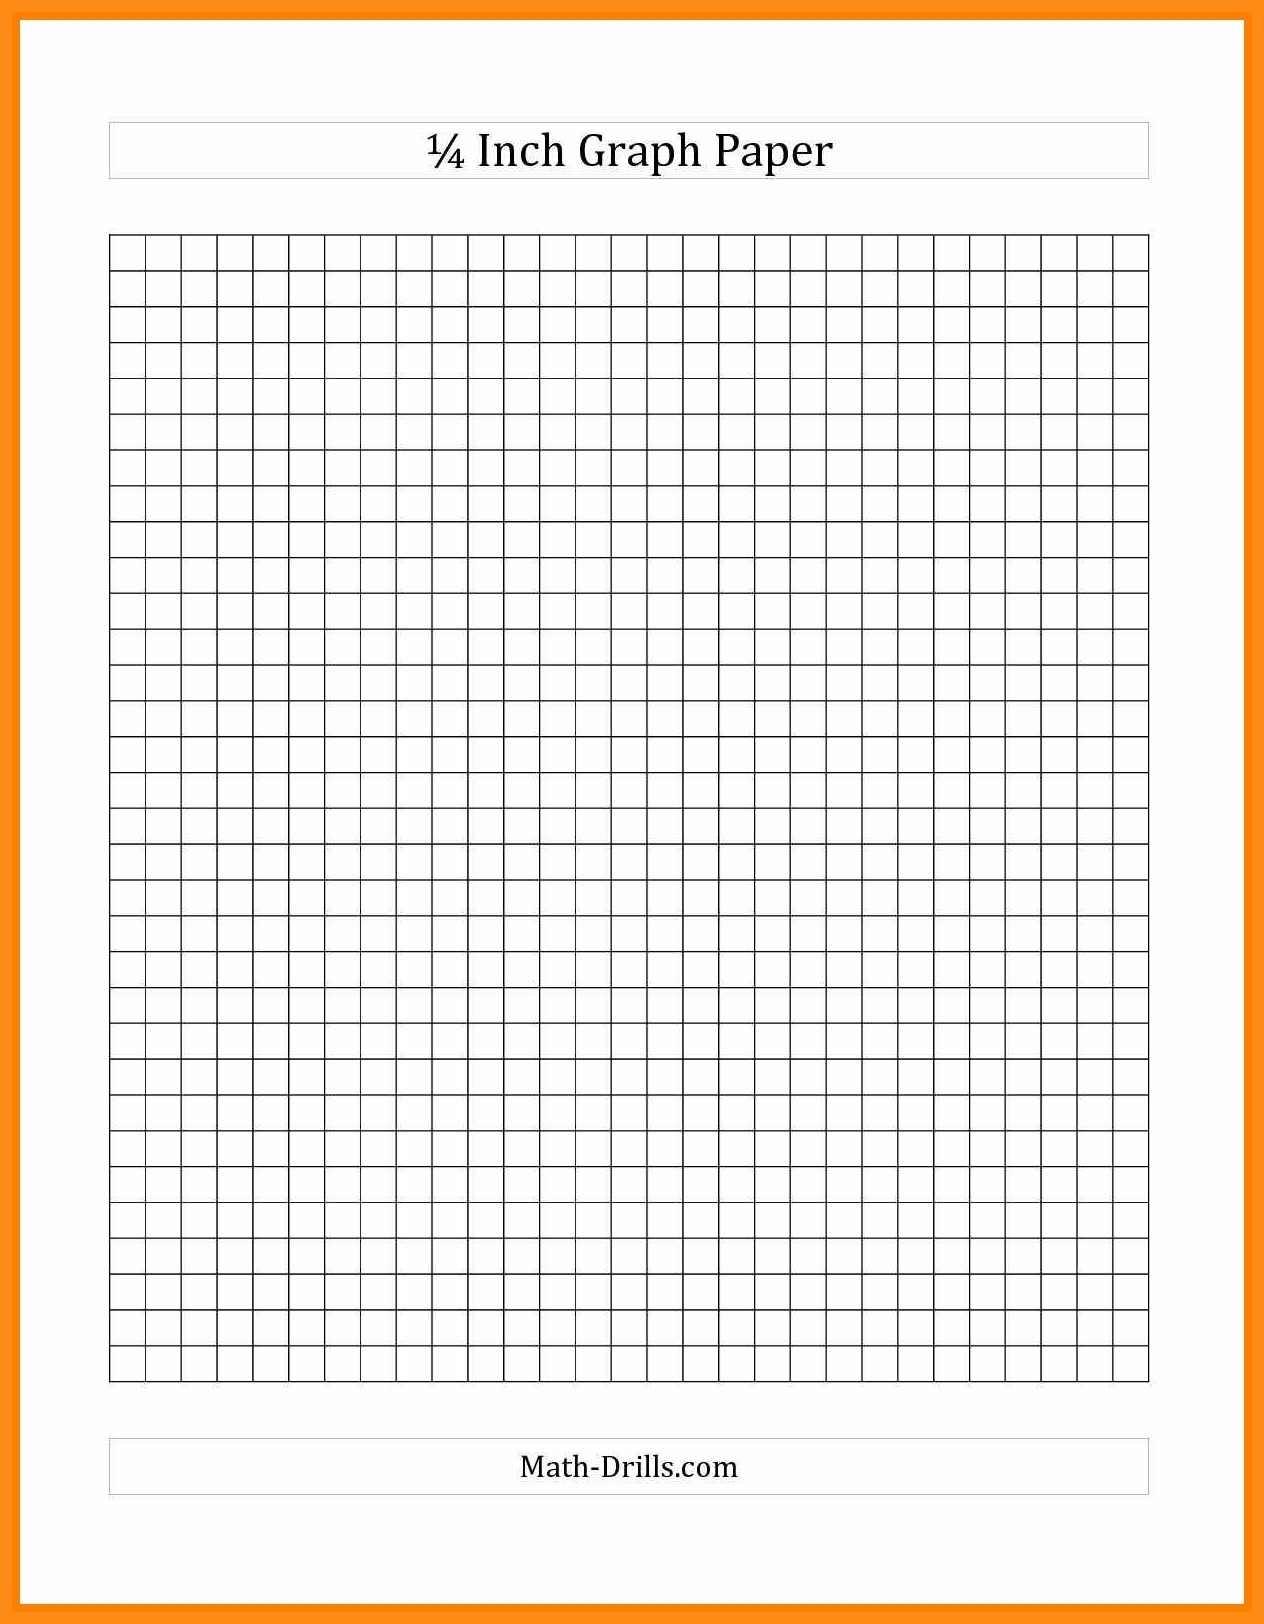 11-12 Quarter Inch Graph Paper | Jadegardenwi - Free Printable Graph Paper 1 4 Inch